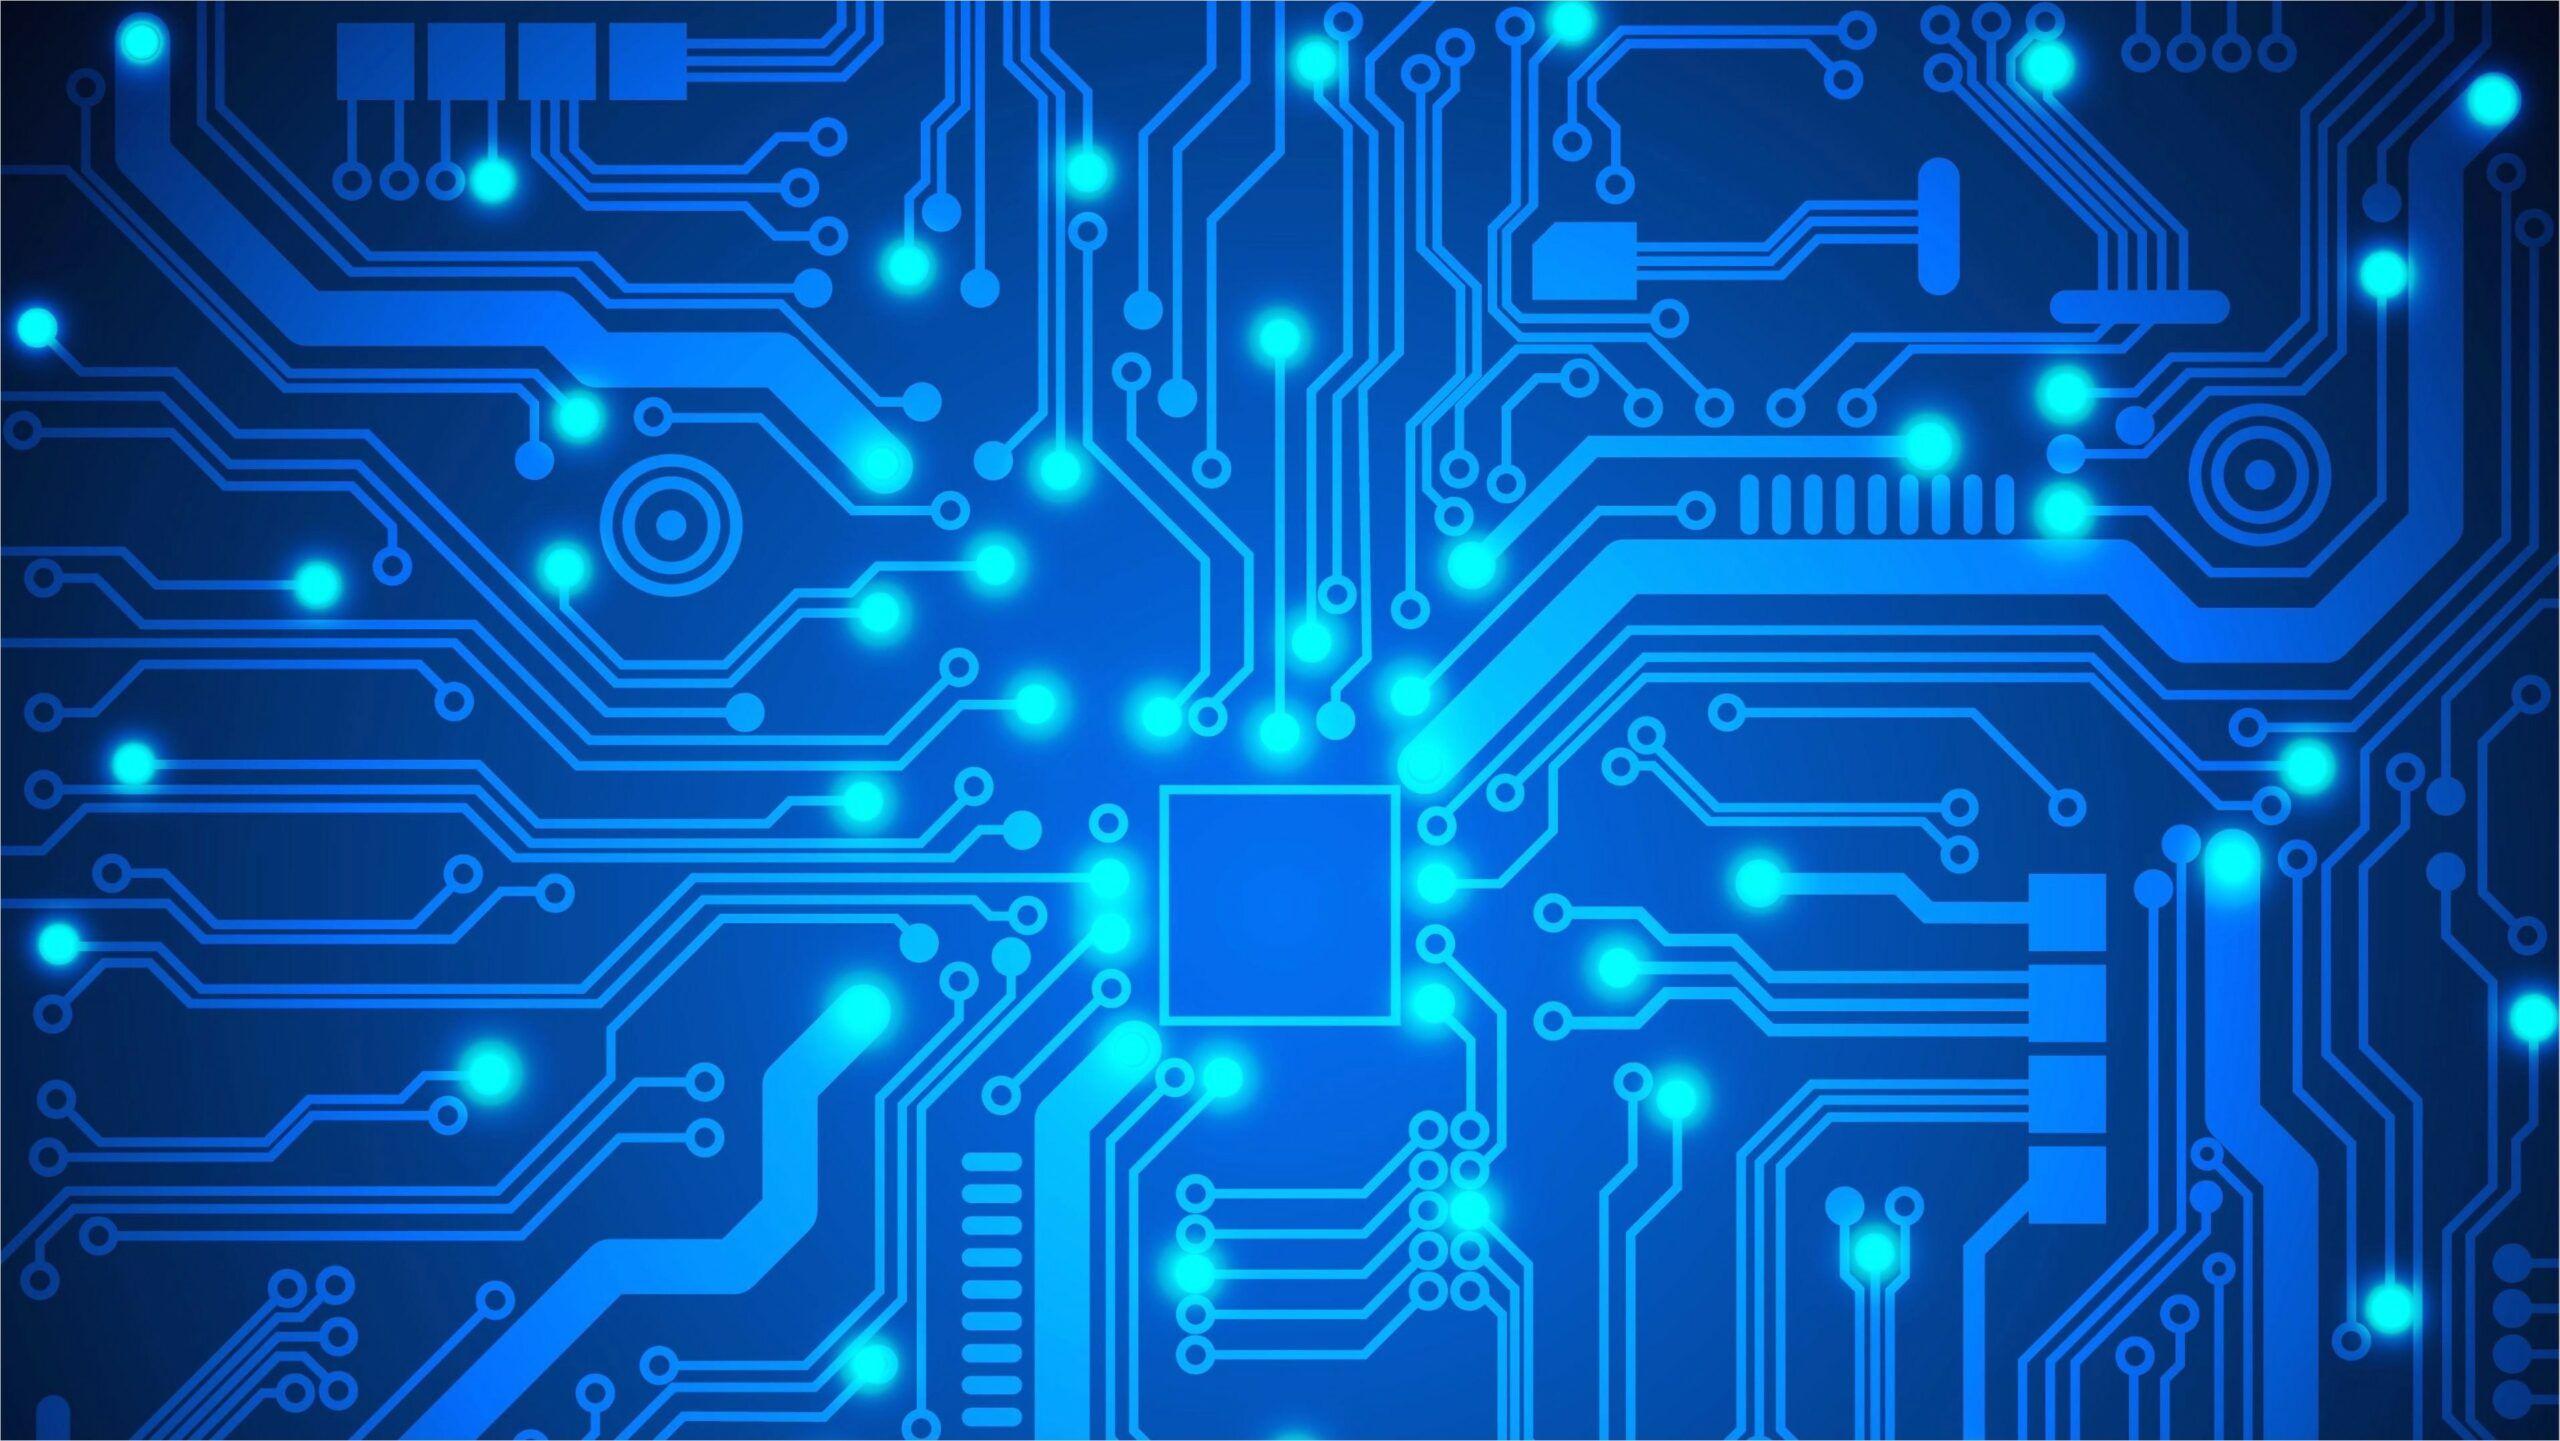 4k 2560 1080 Wallpapers Vlsi Electronics Wallpaper Active Wallpaper Printed Circuit Board